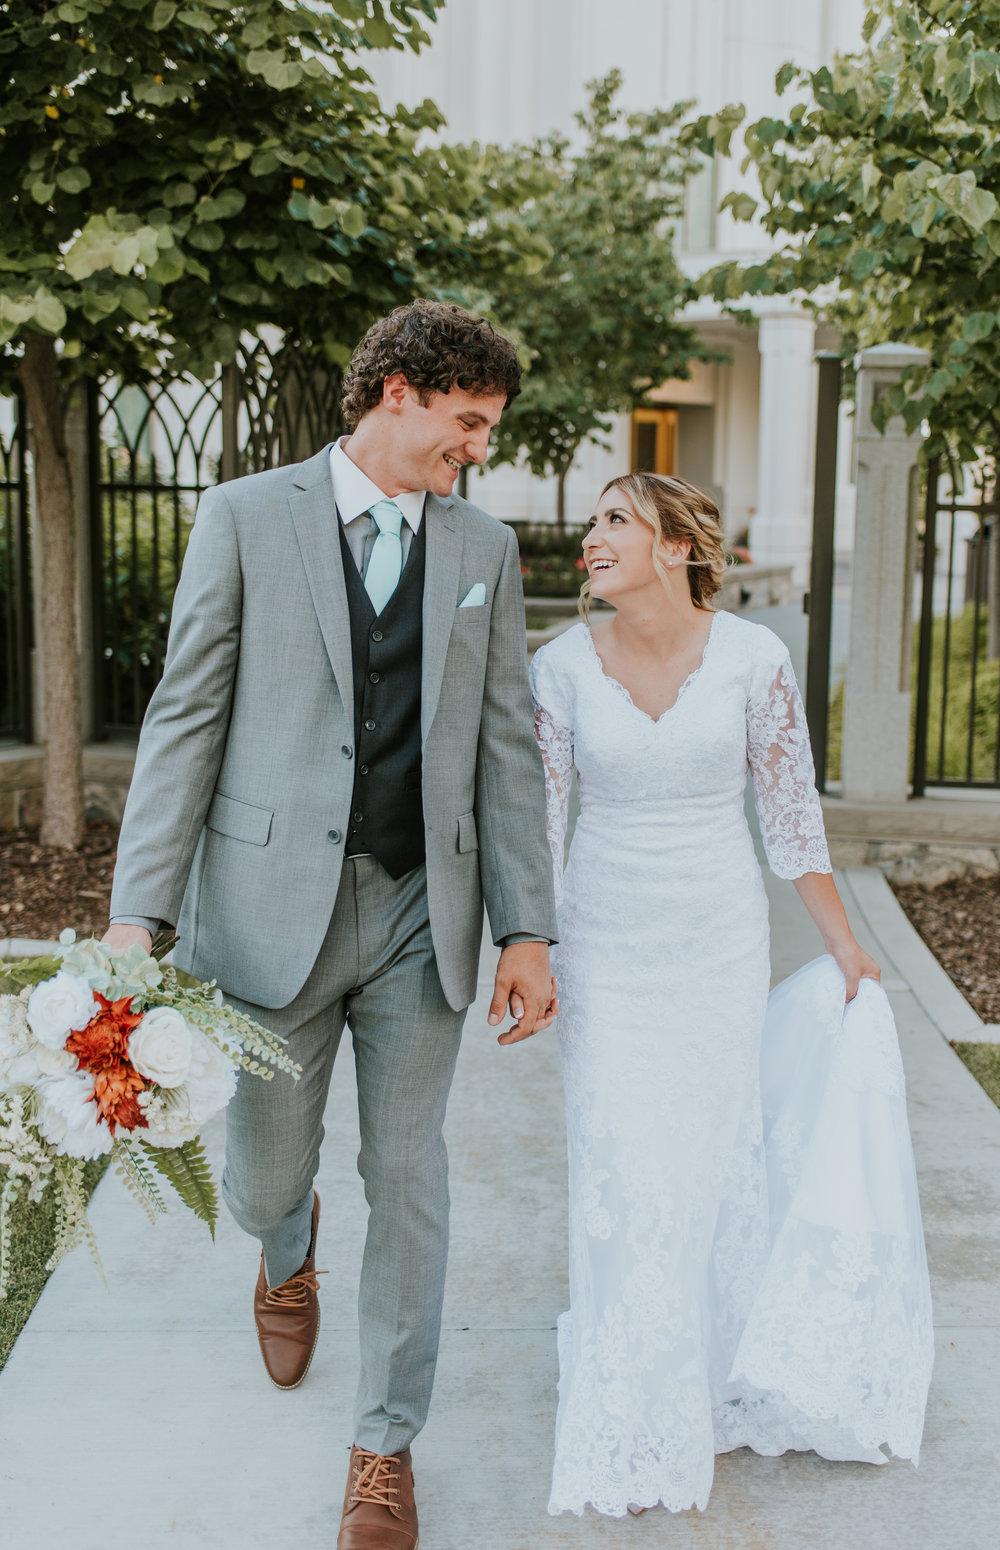 Fantastic Wedding Zoot Suits Pattern - Wedding Dress Ideas ...